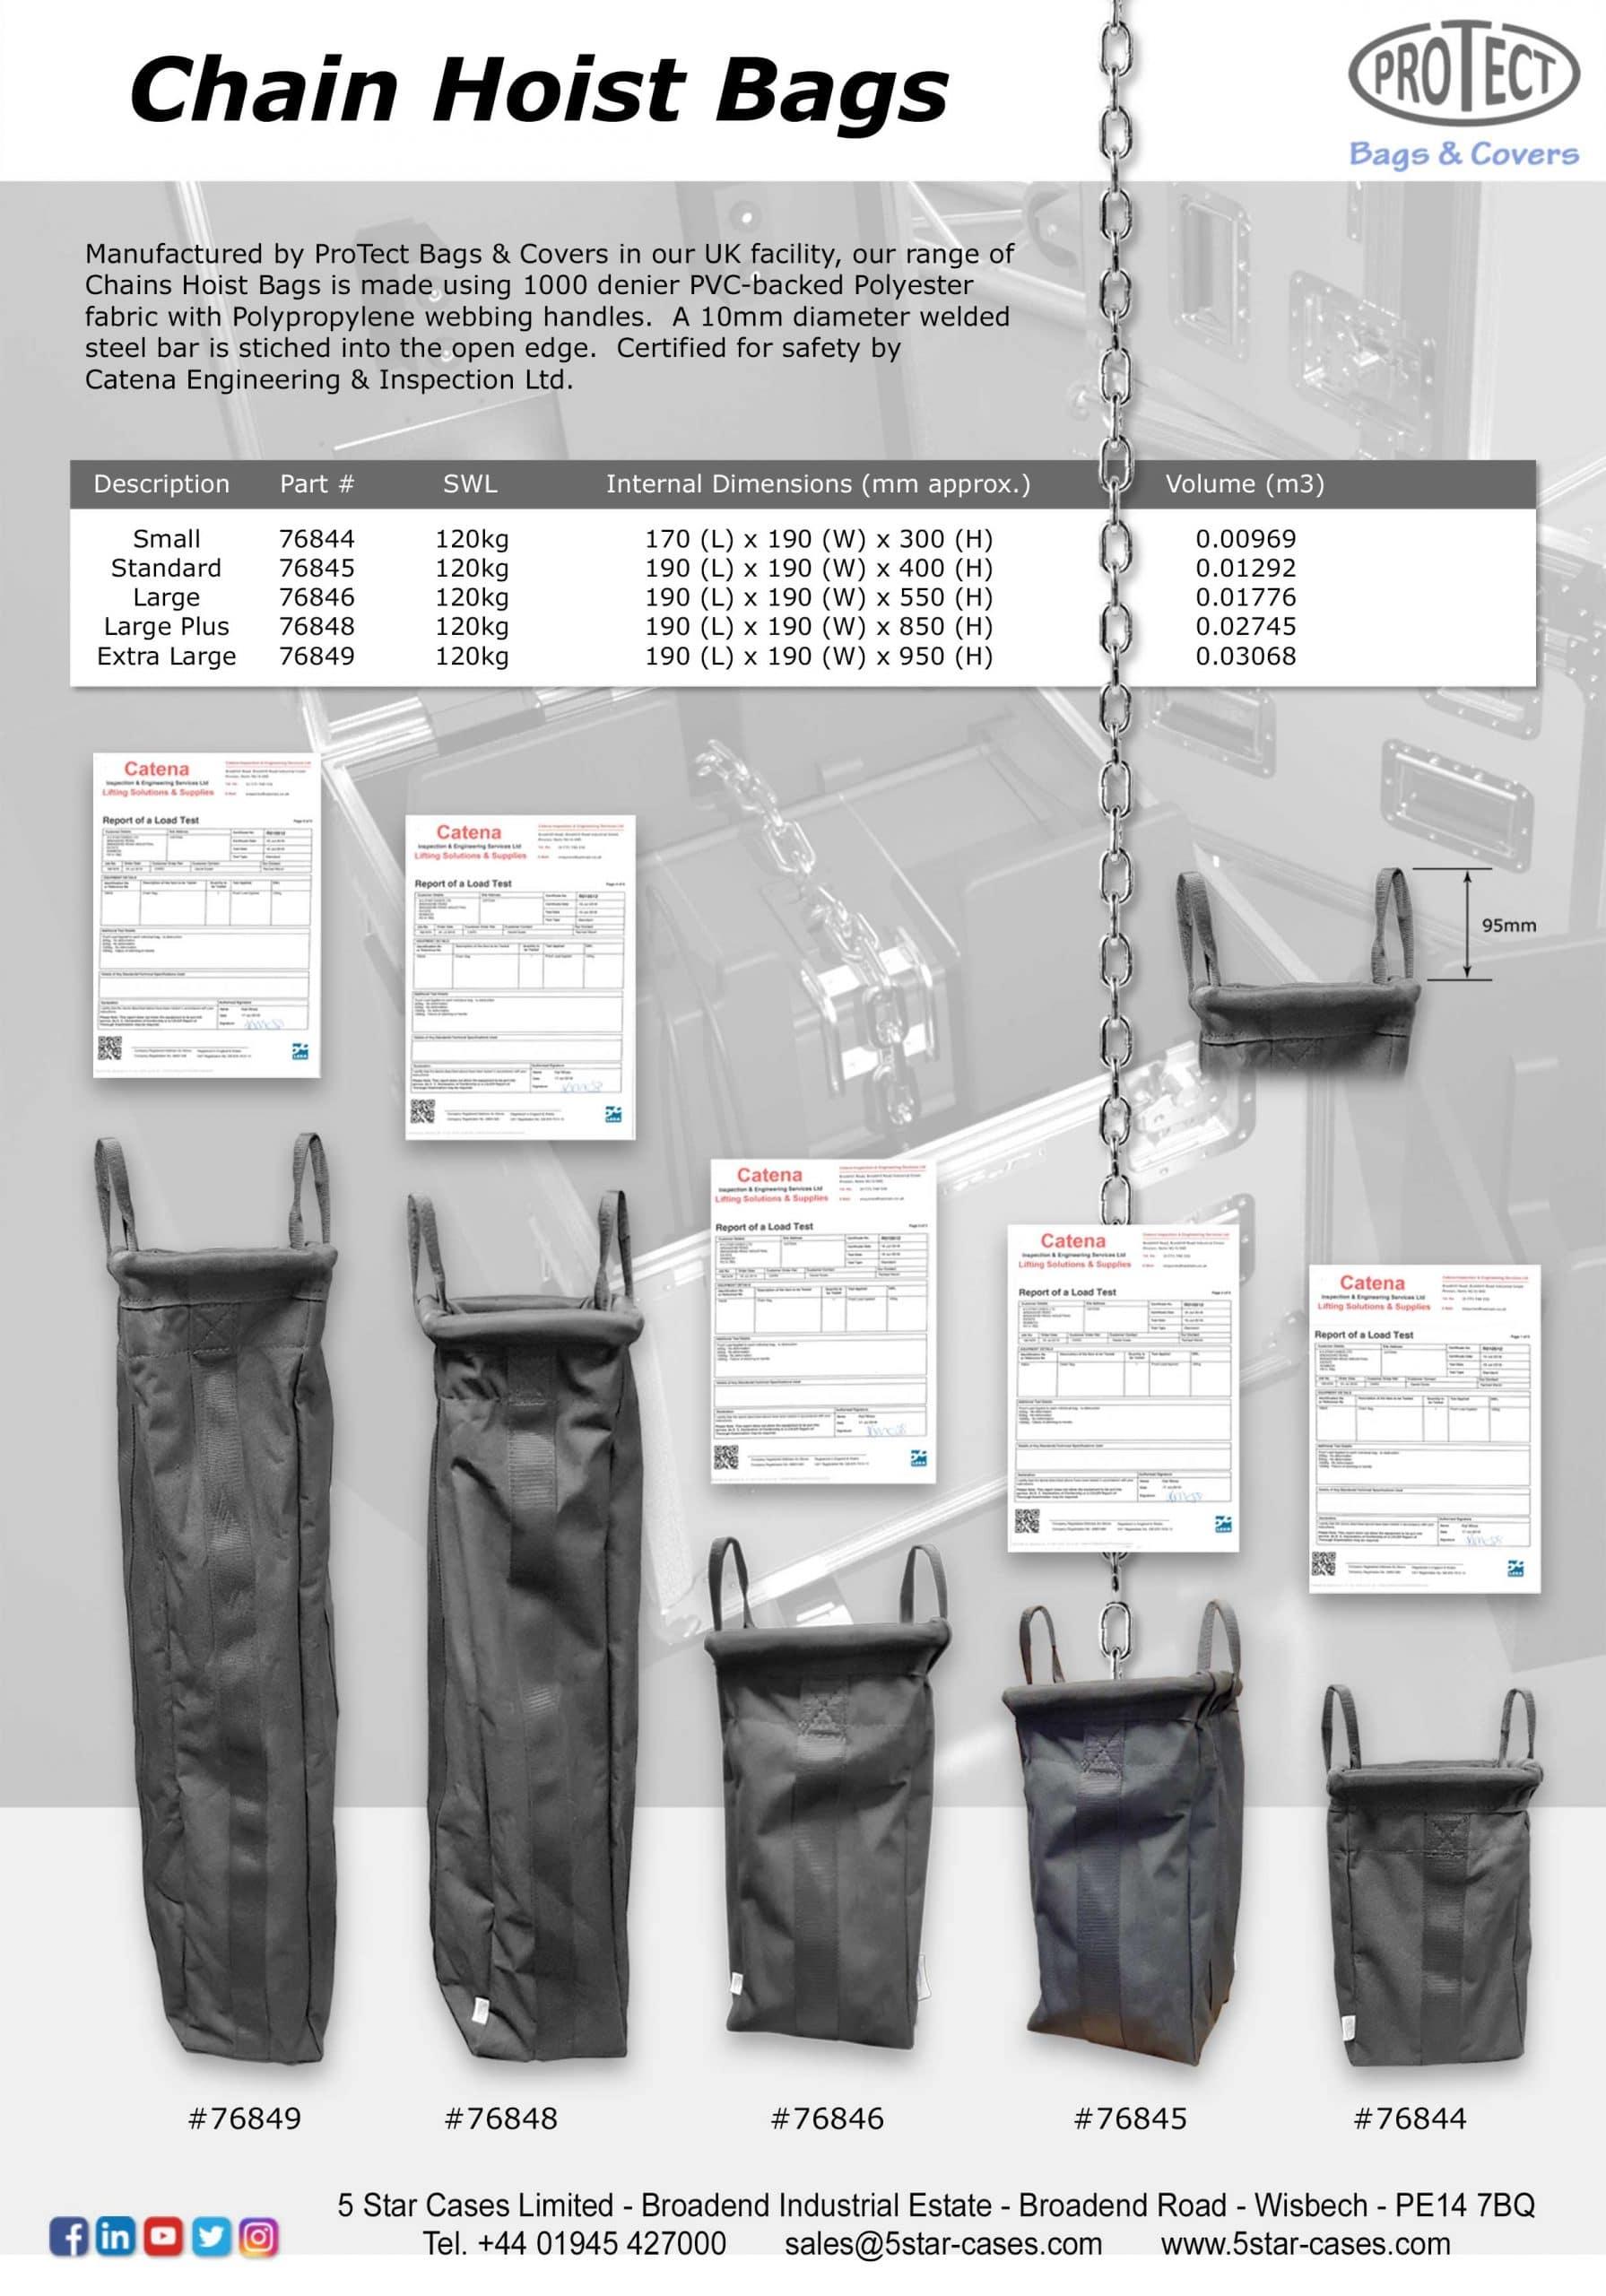 Chain Hoist Bags Leaflet 2021